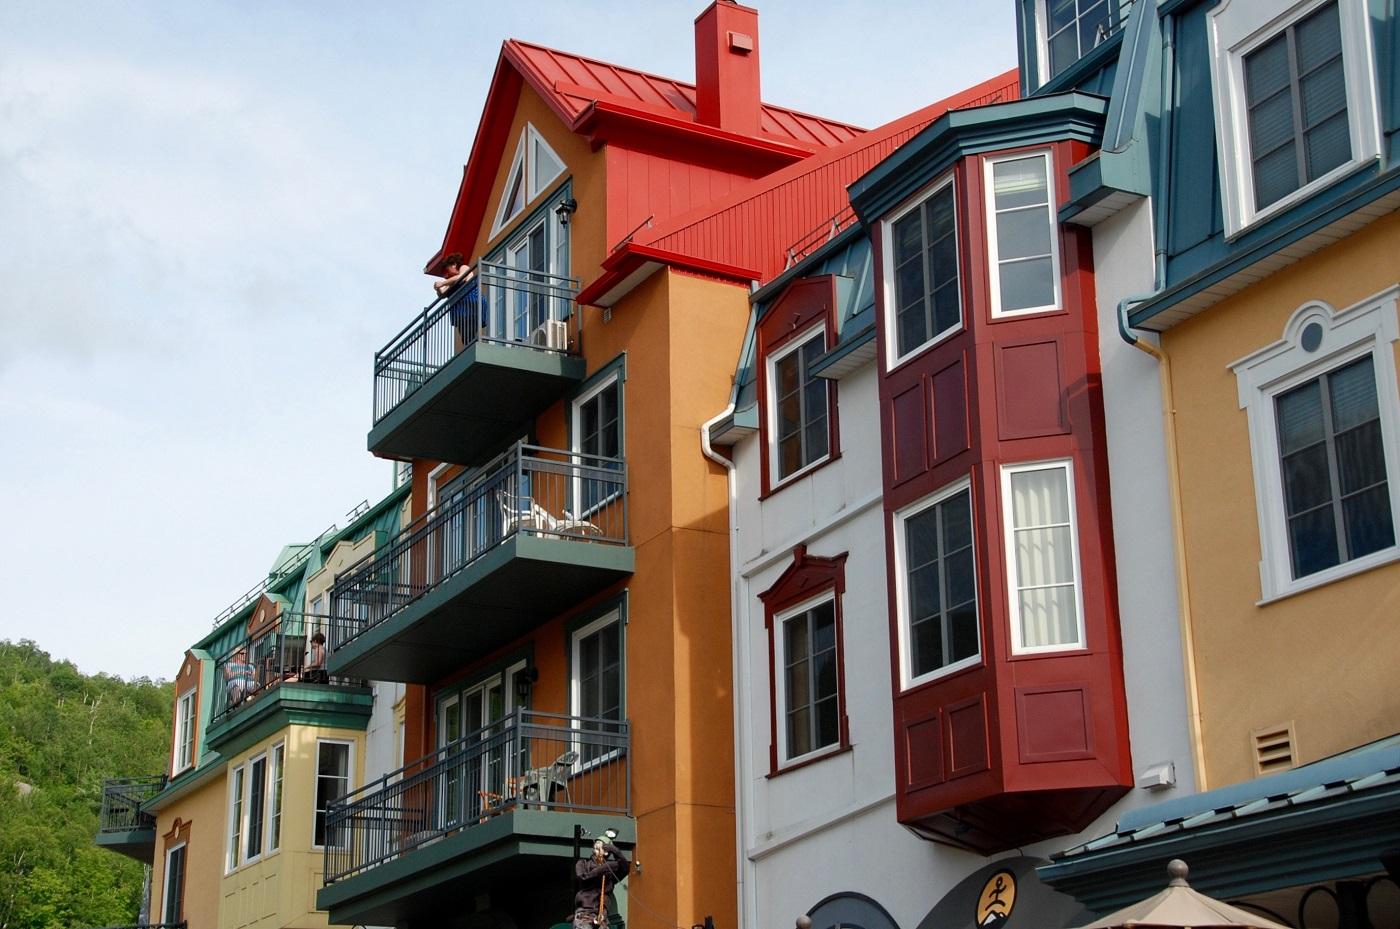 Should I Hire a Property Manager?